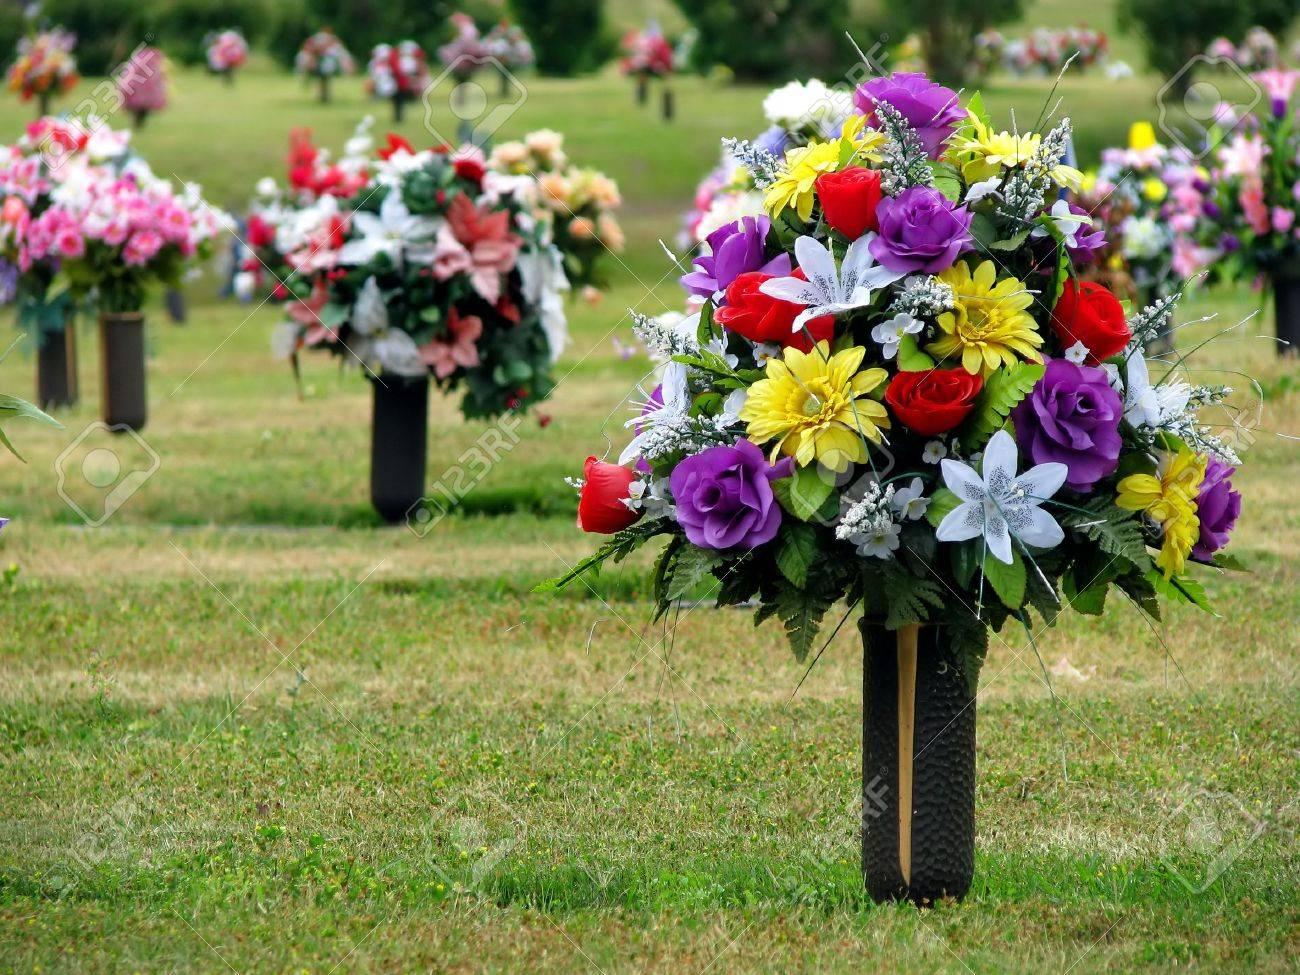 123RF.com & colorful silk flower vases in summer cemetery